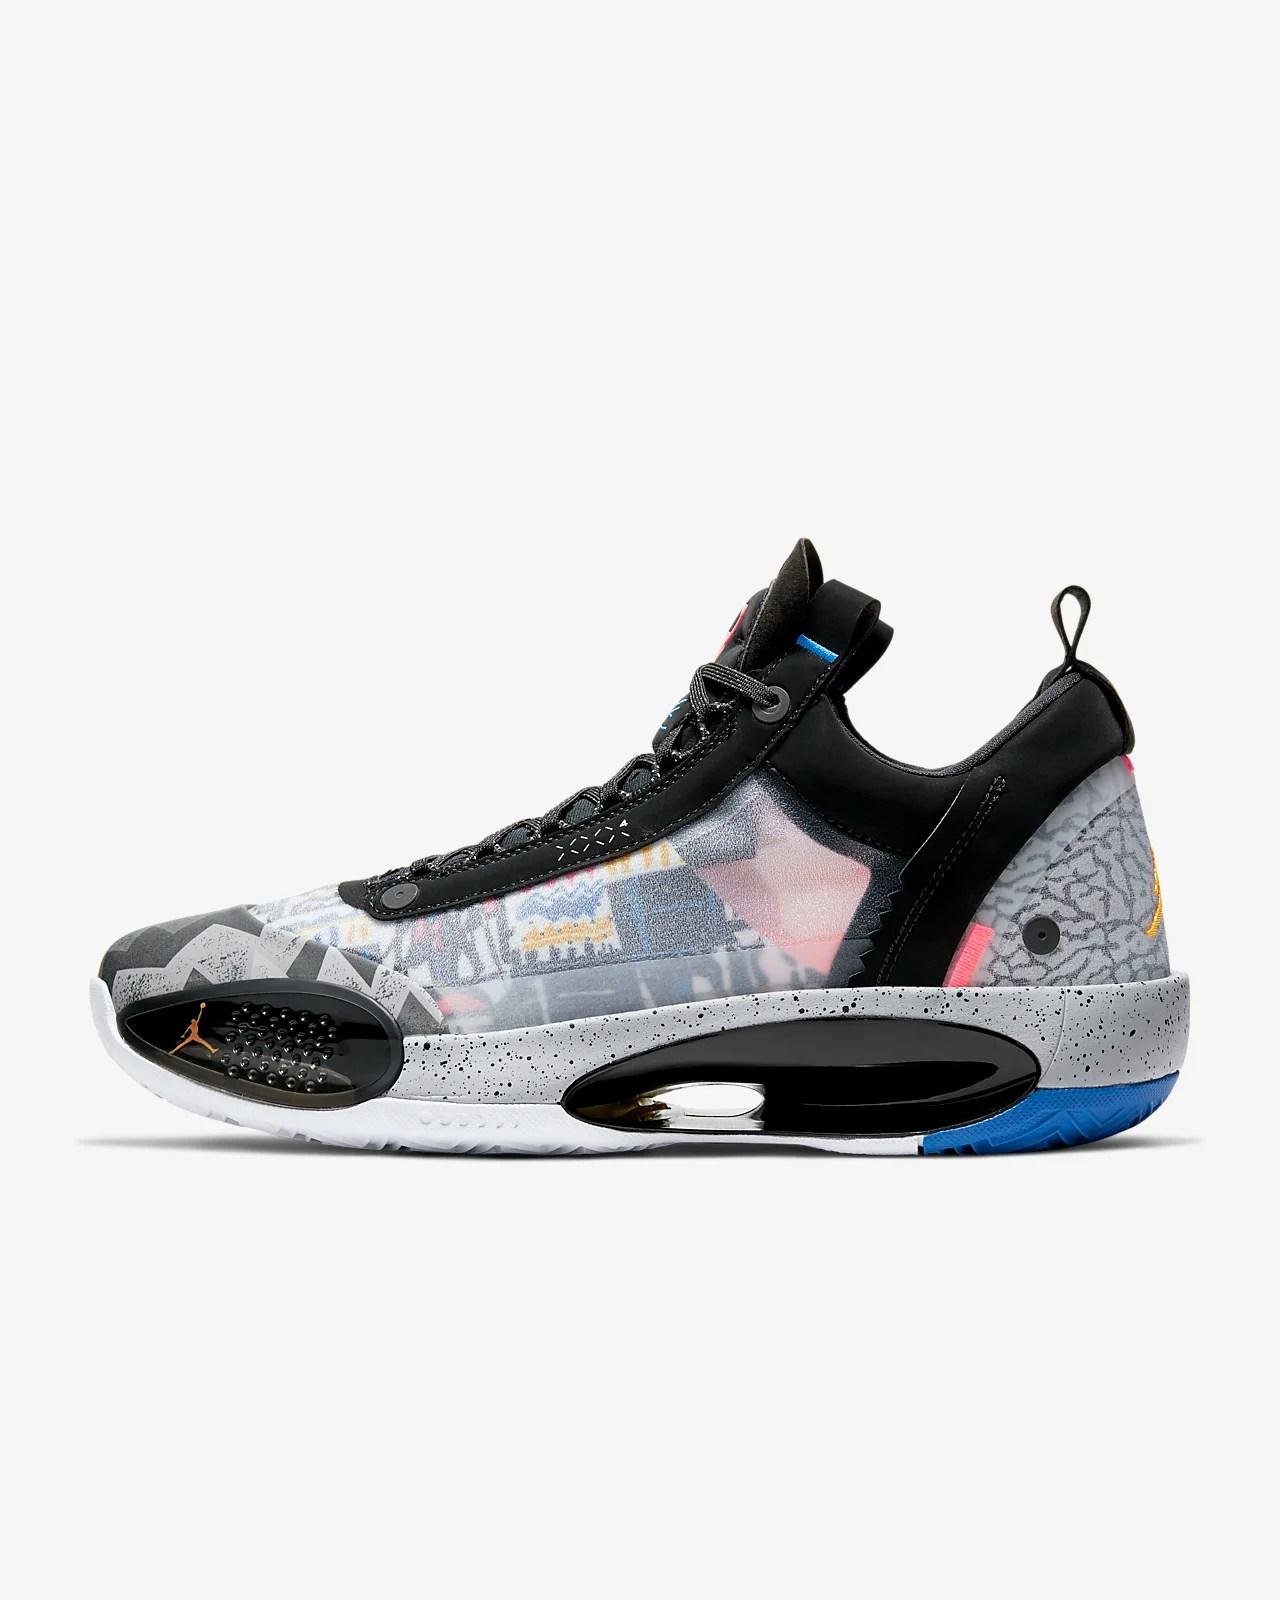 Air Jordan XXXIV 低筒 PF 籃球鞋. Nike TW